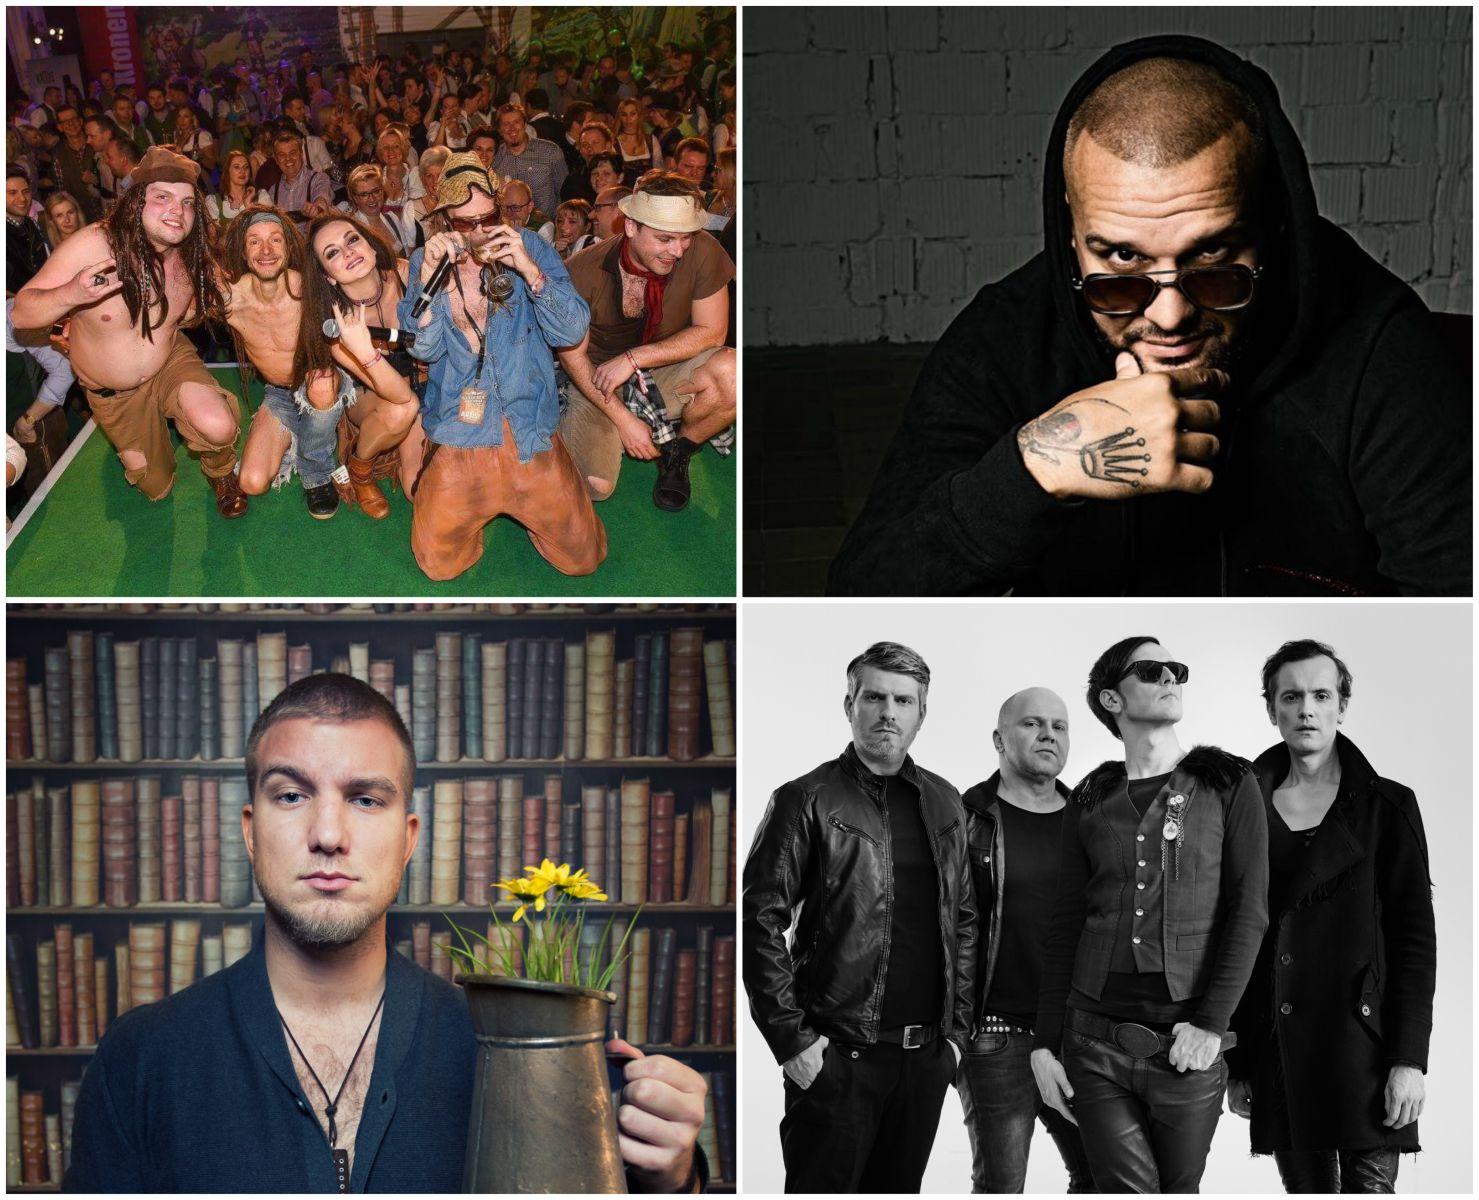 Rytmus aj Rednex s novou slovenskou speváčkou budú hviezdami Nestville Open Festu